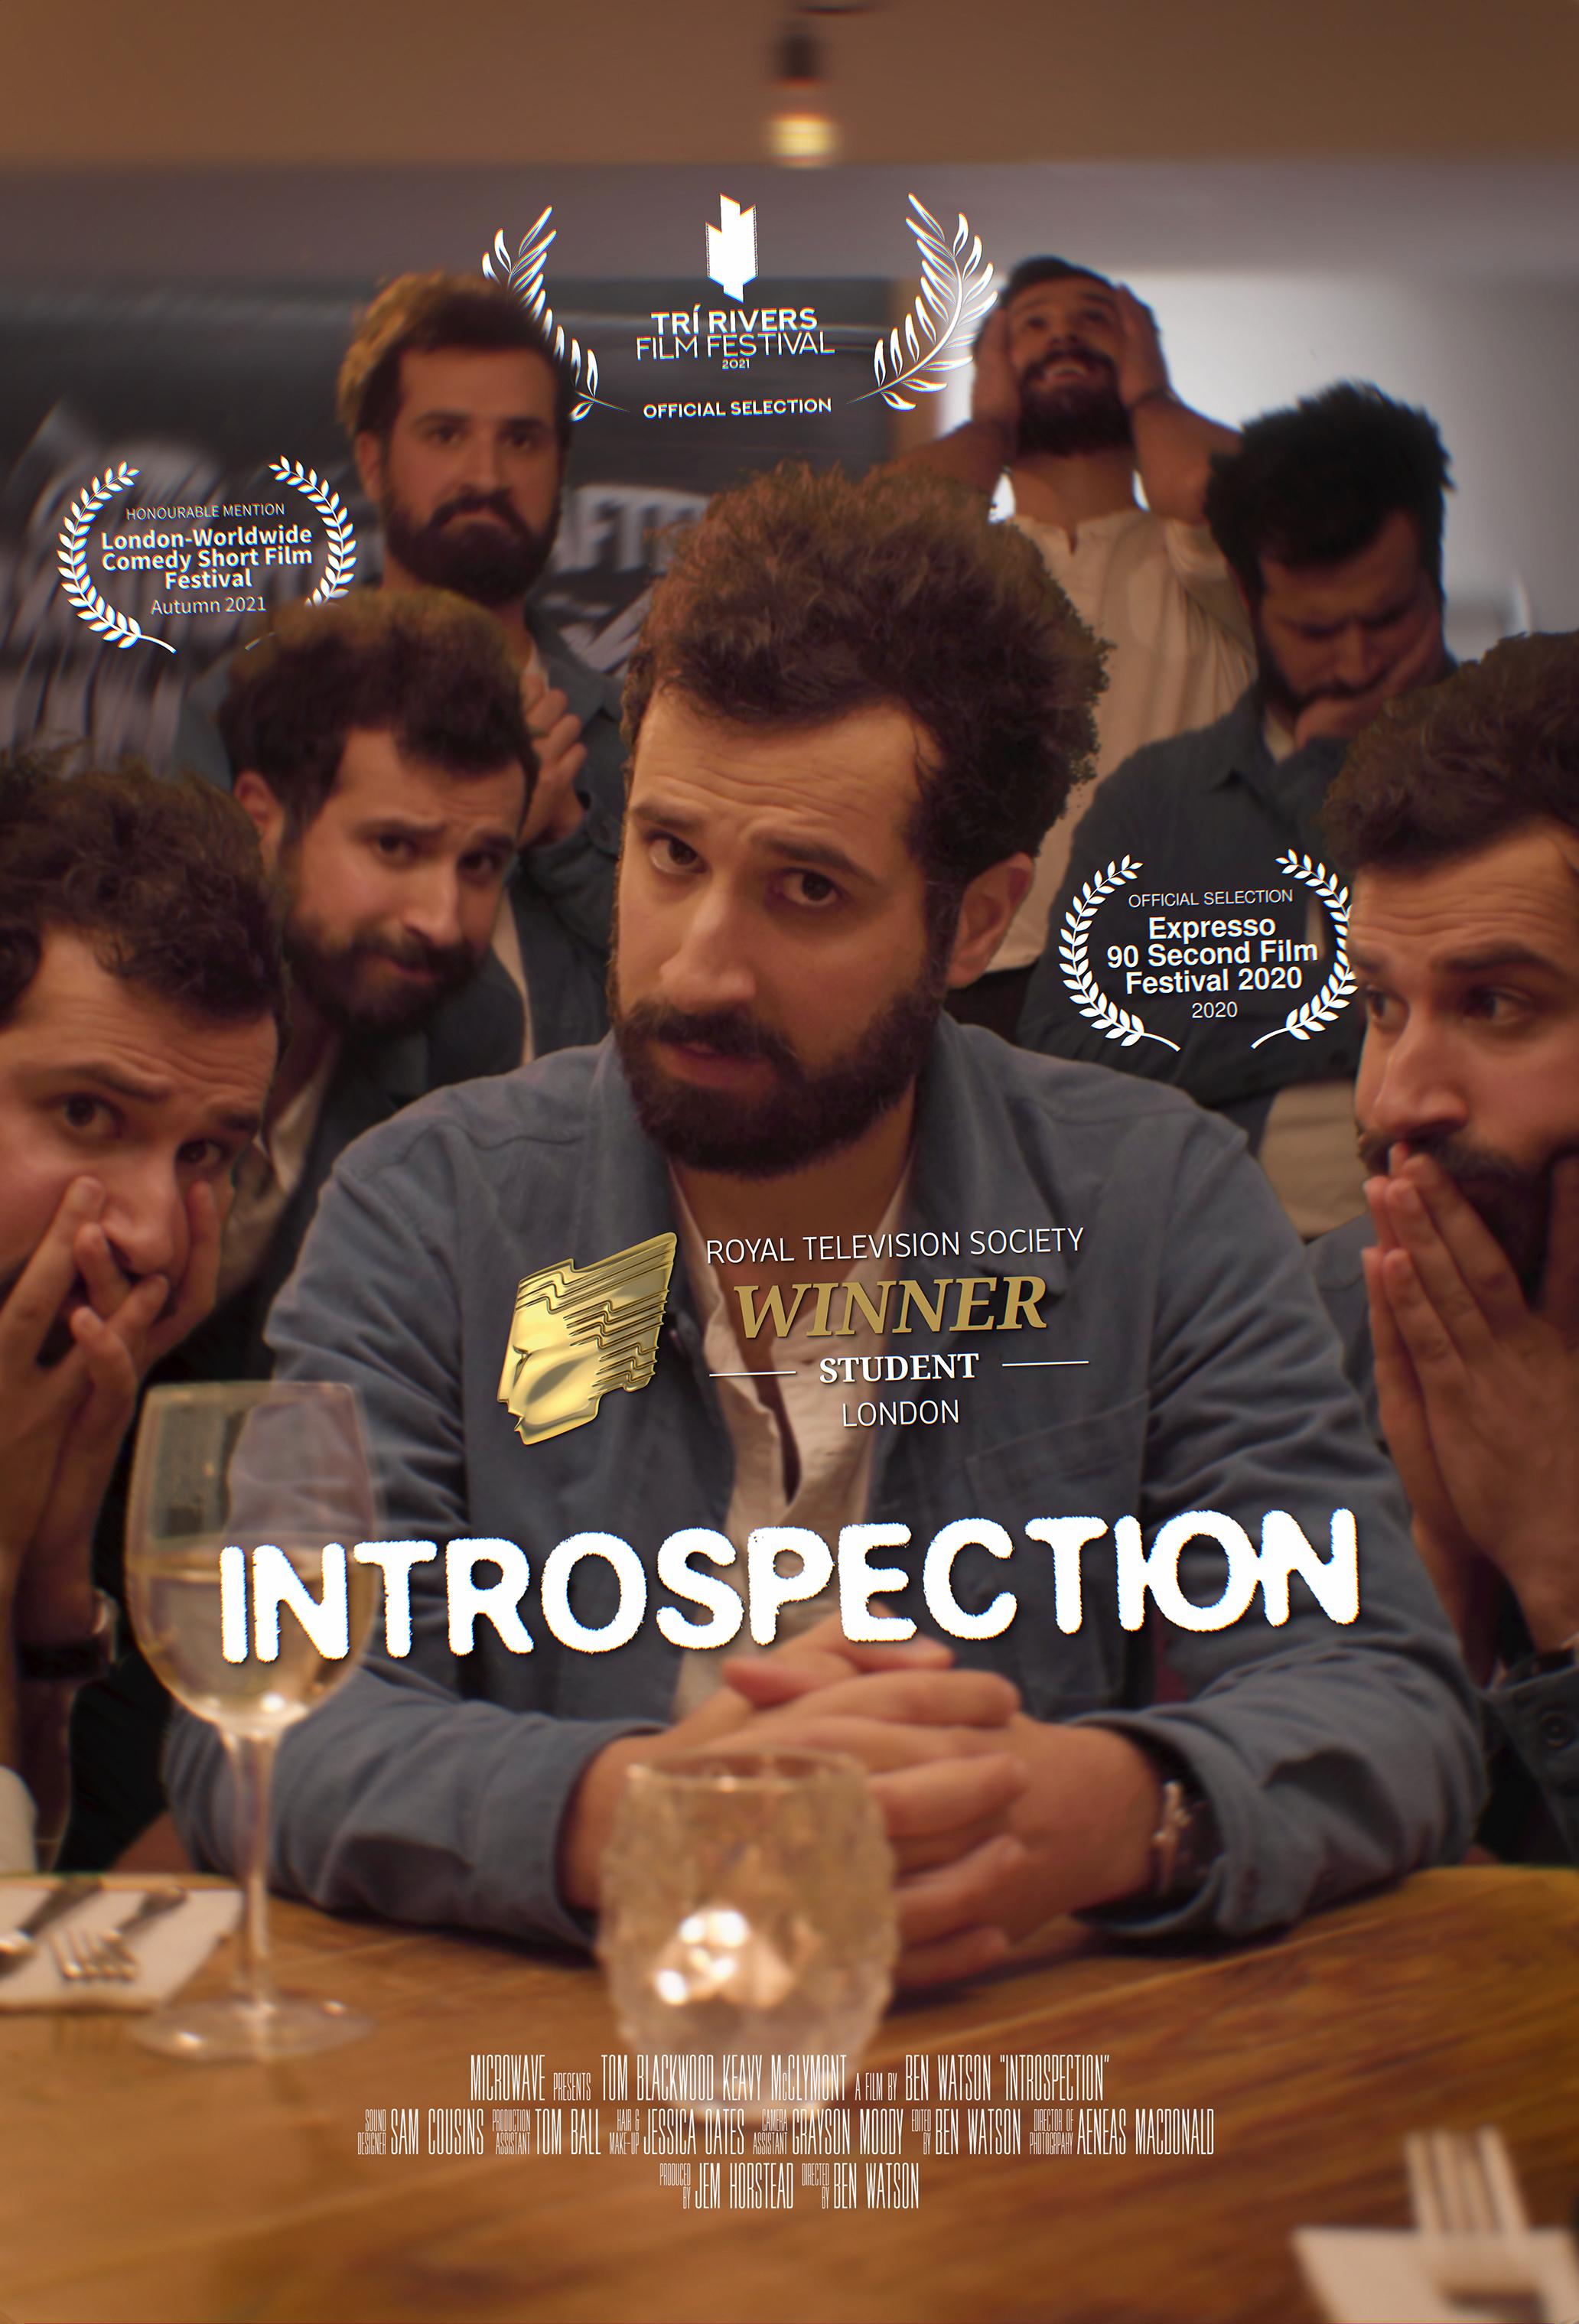 Introspection